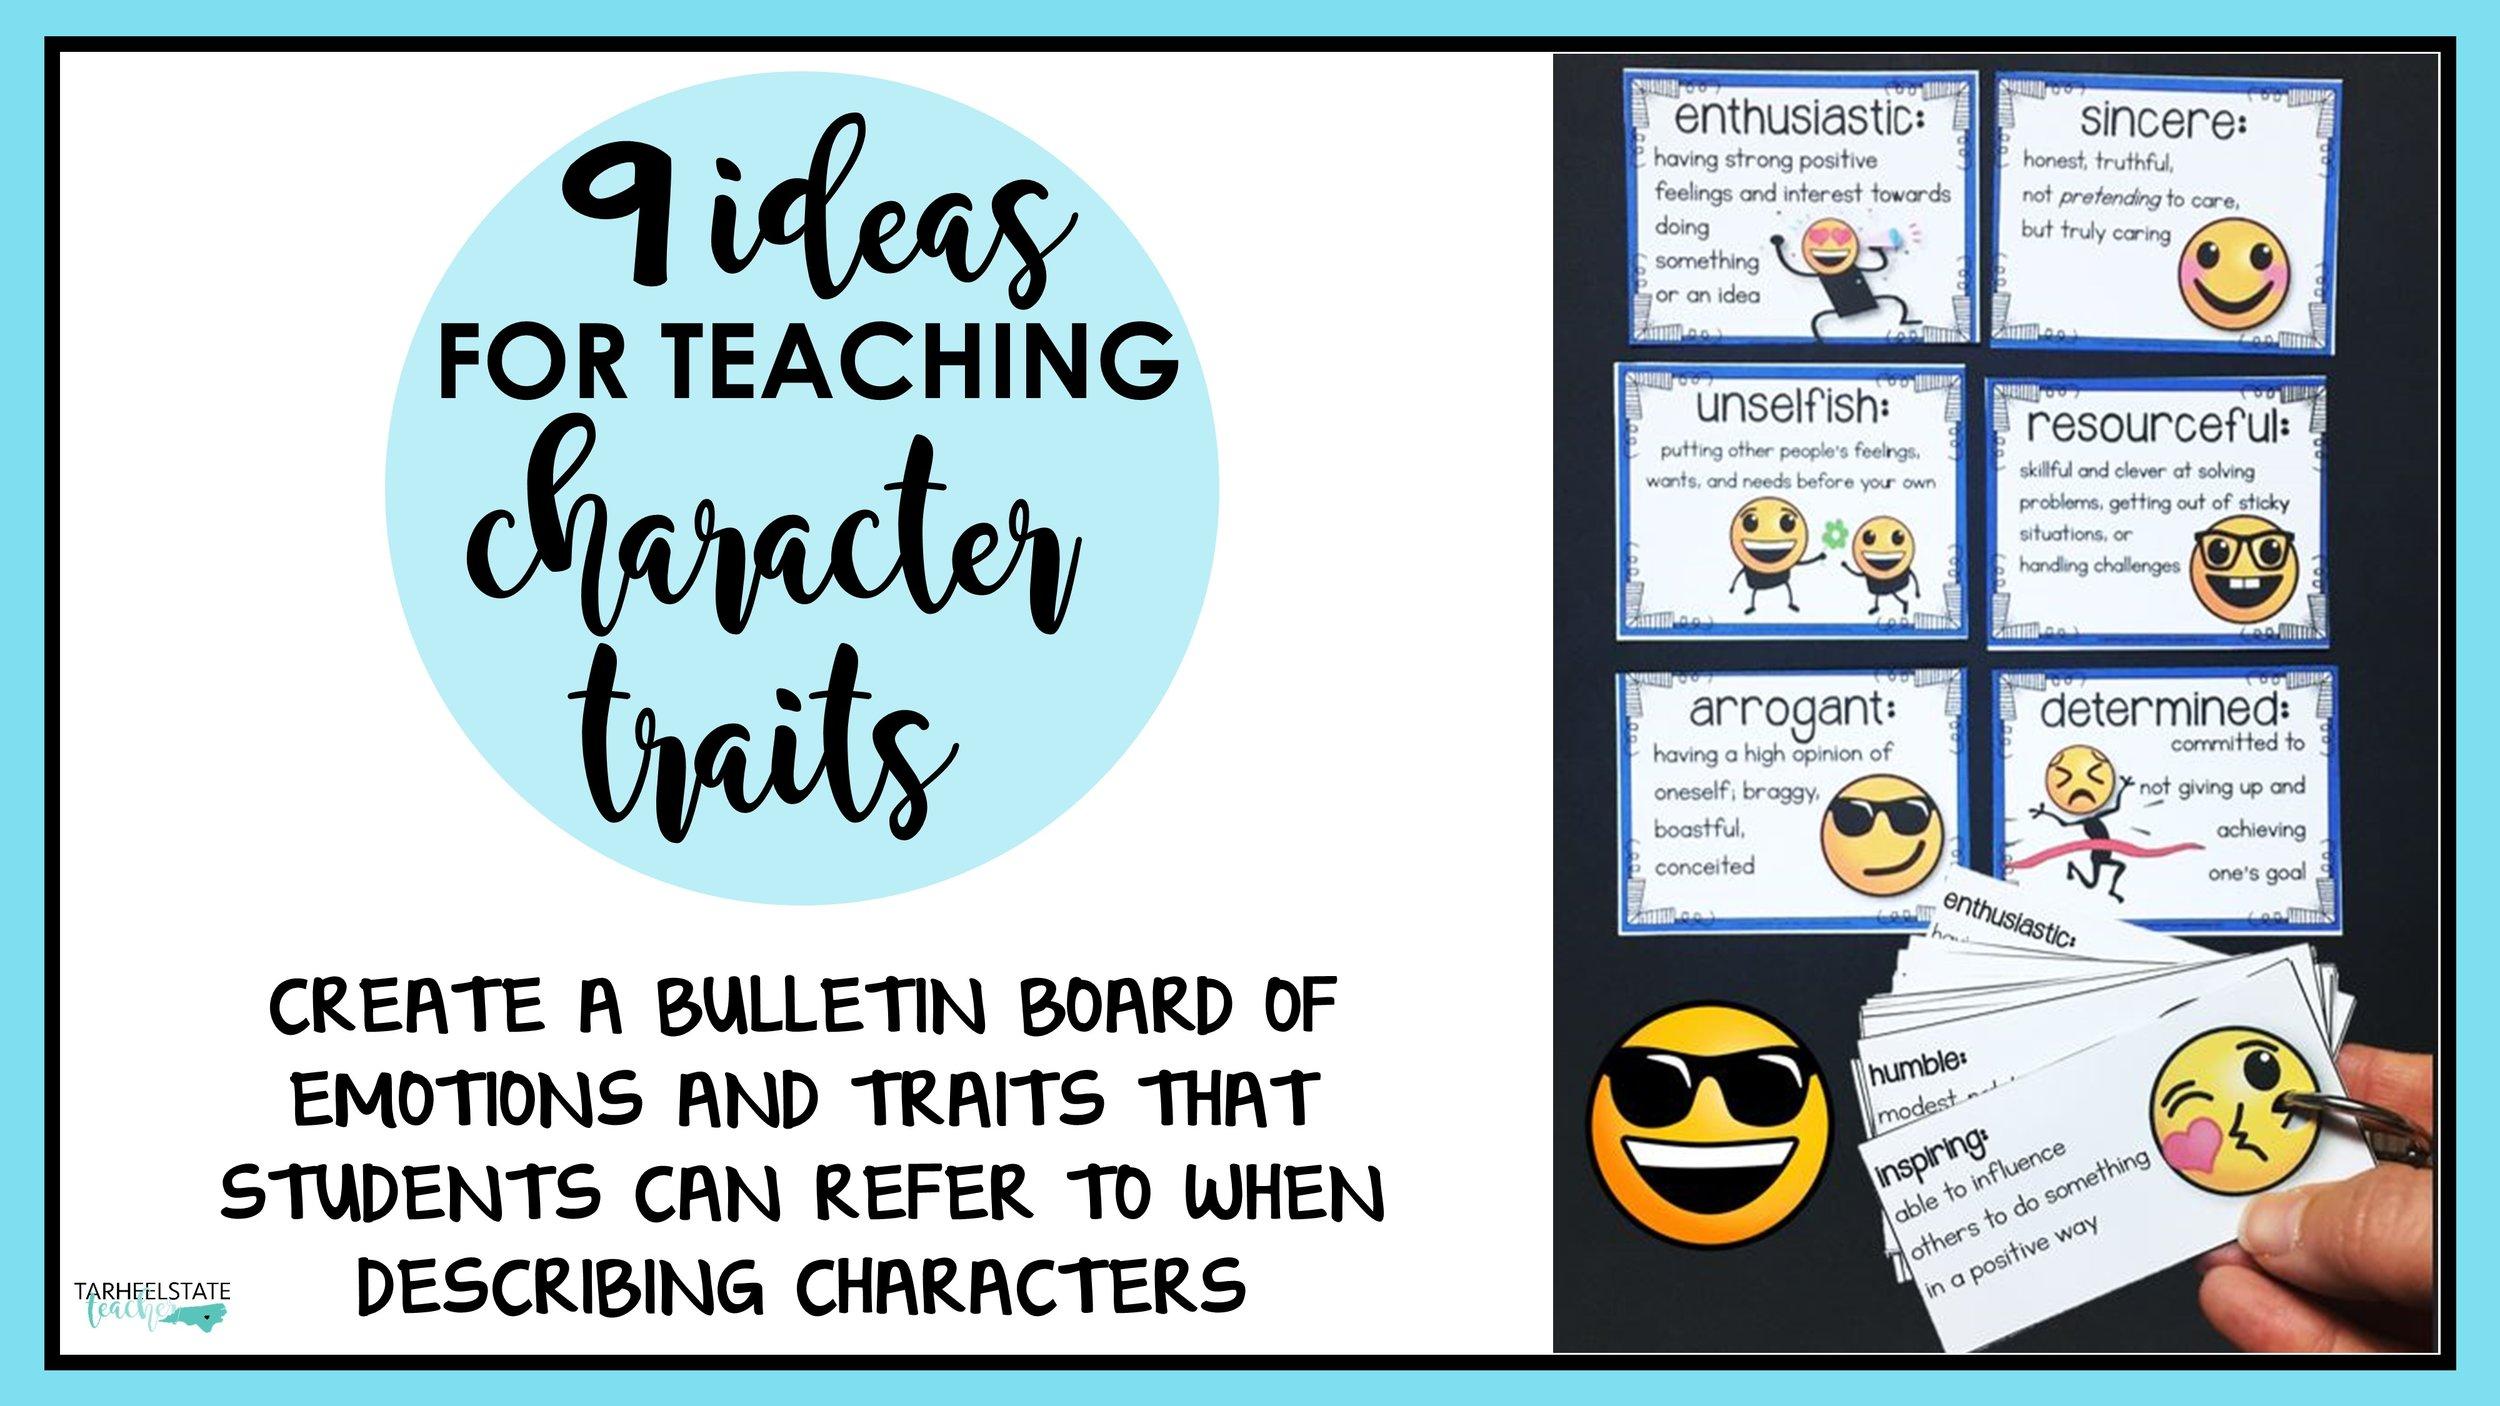 character traits bulletin board.jpg